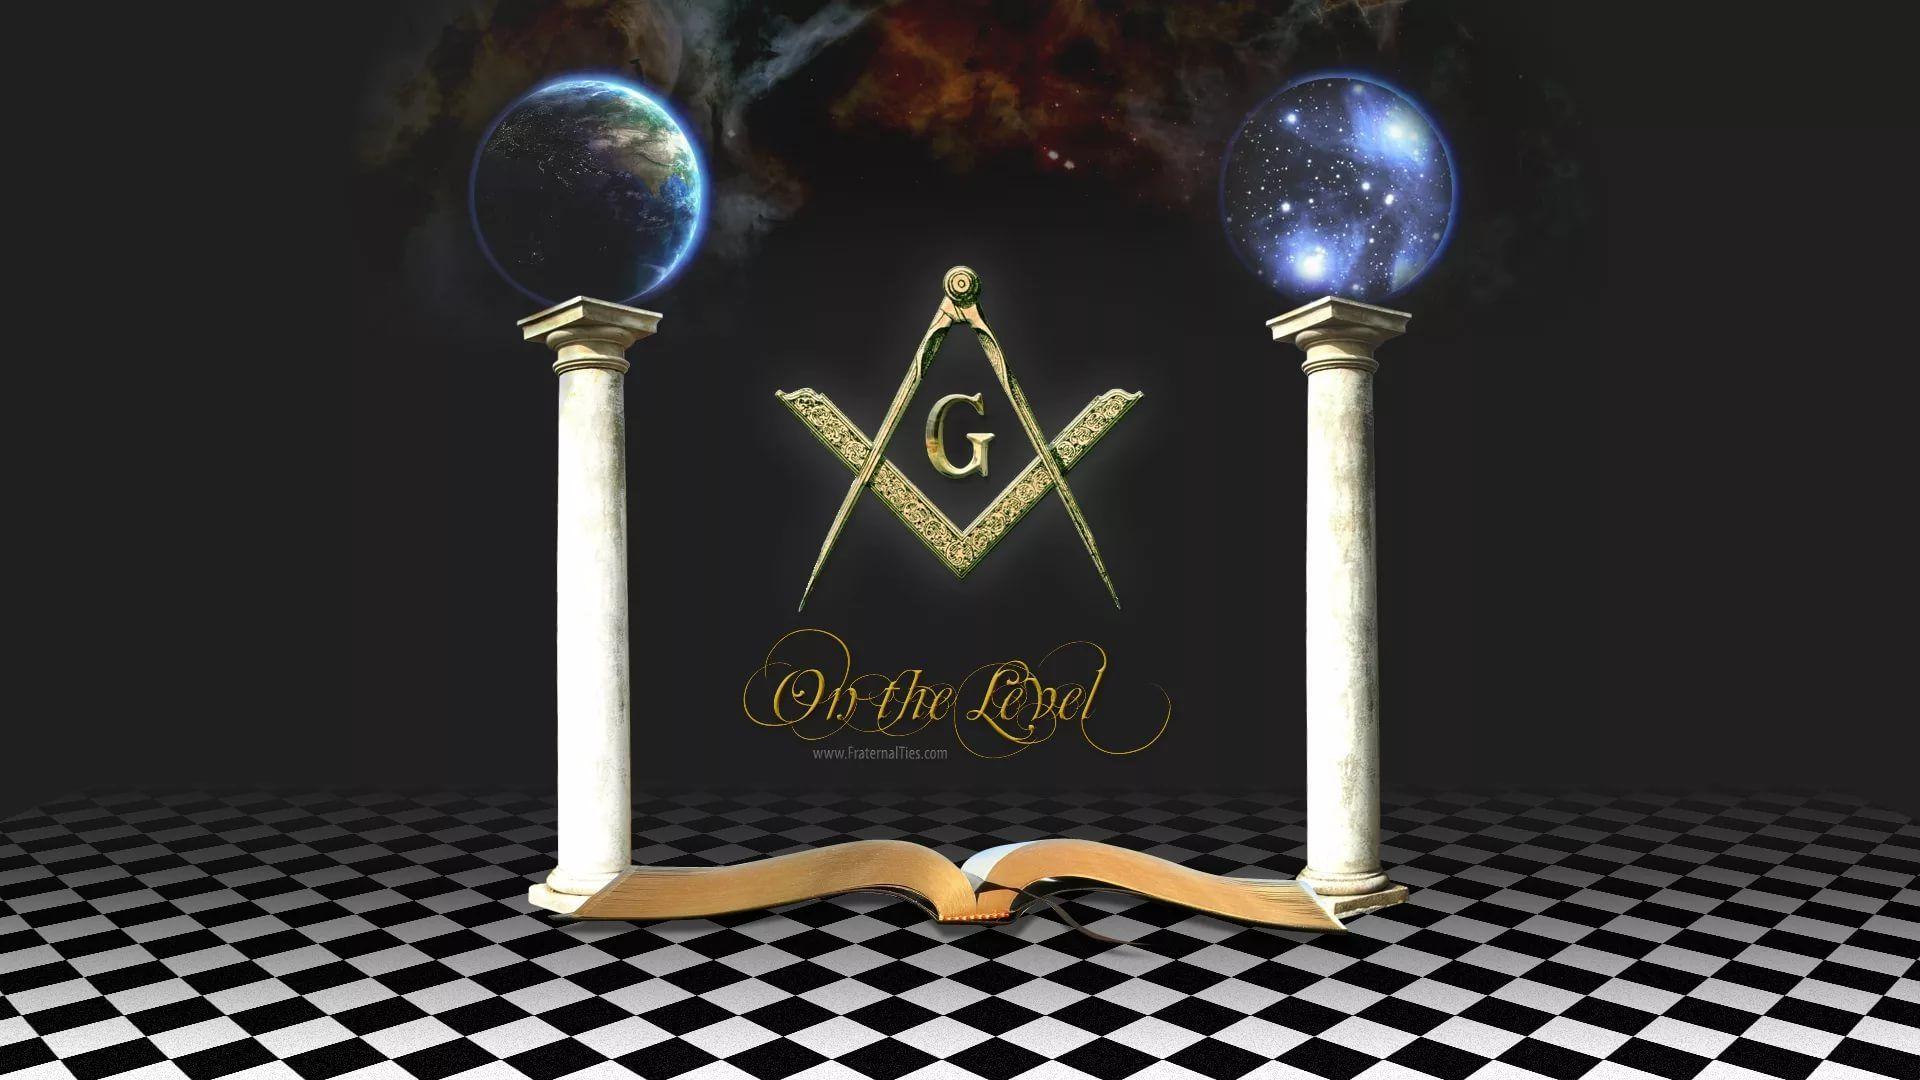 Freemason desktop wallpaper